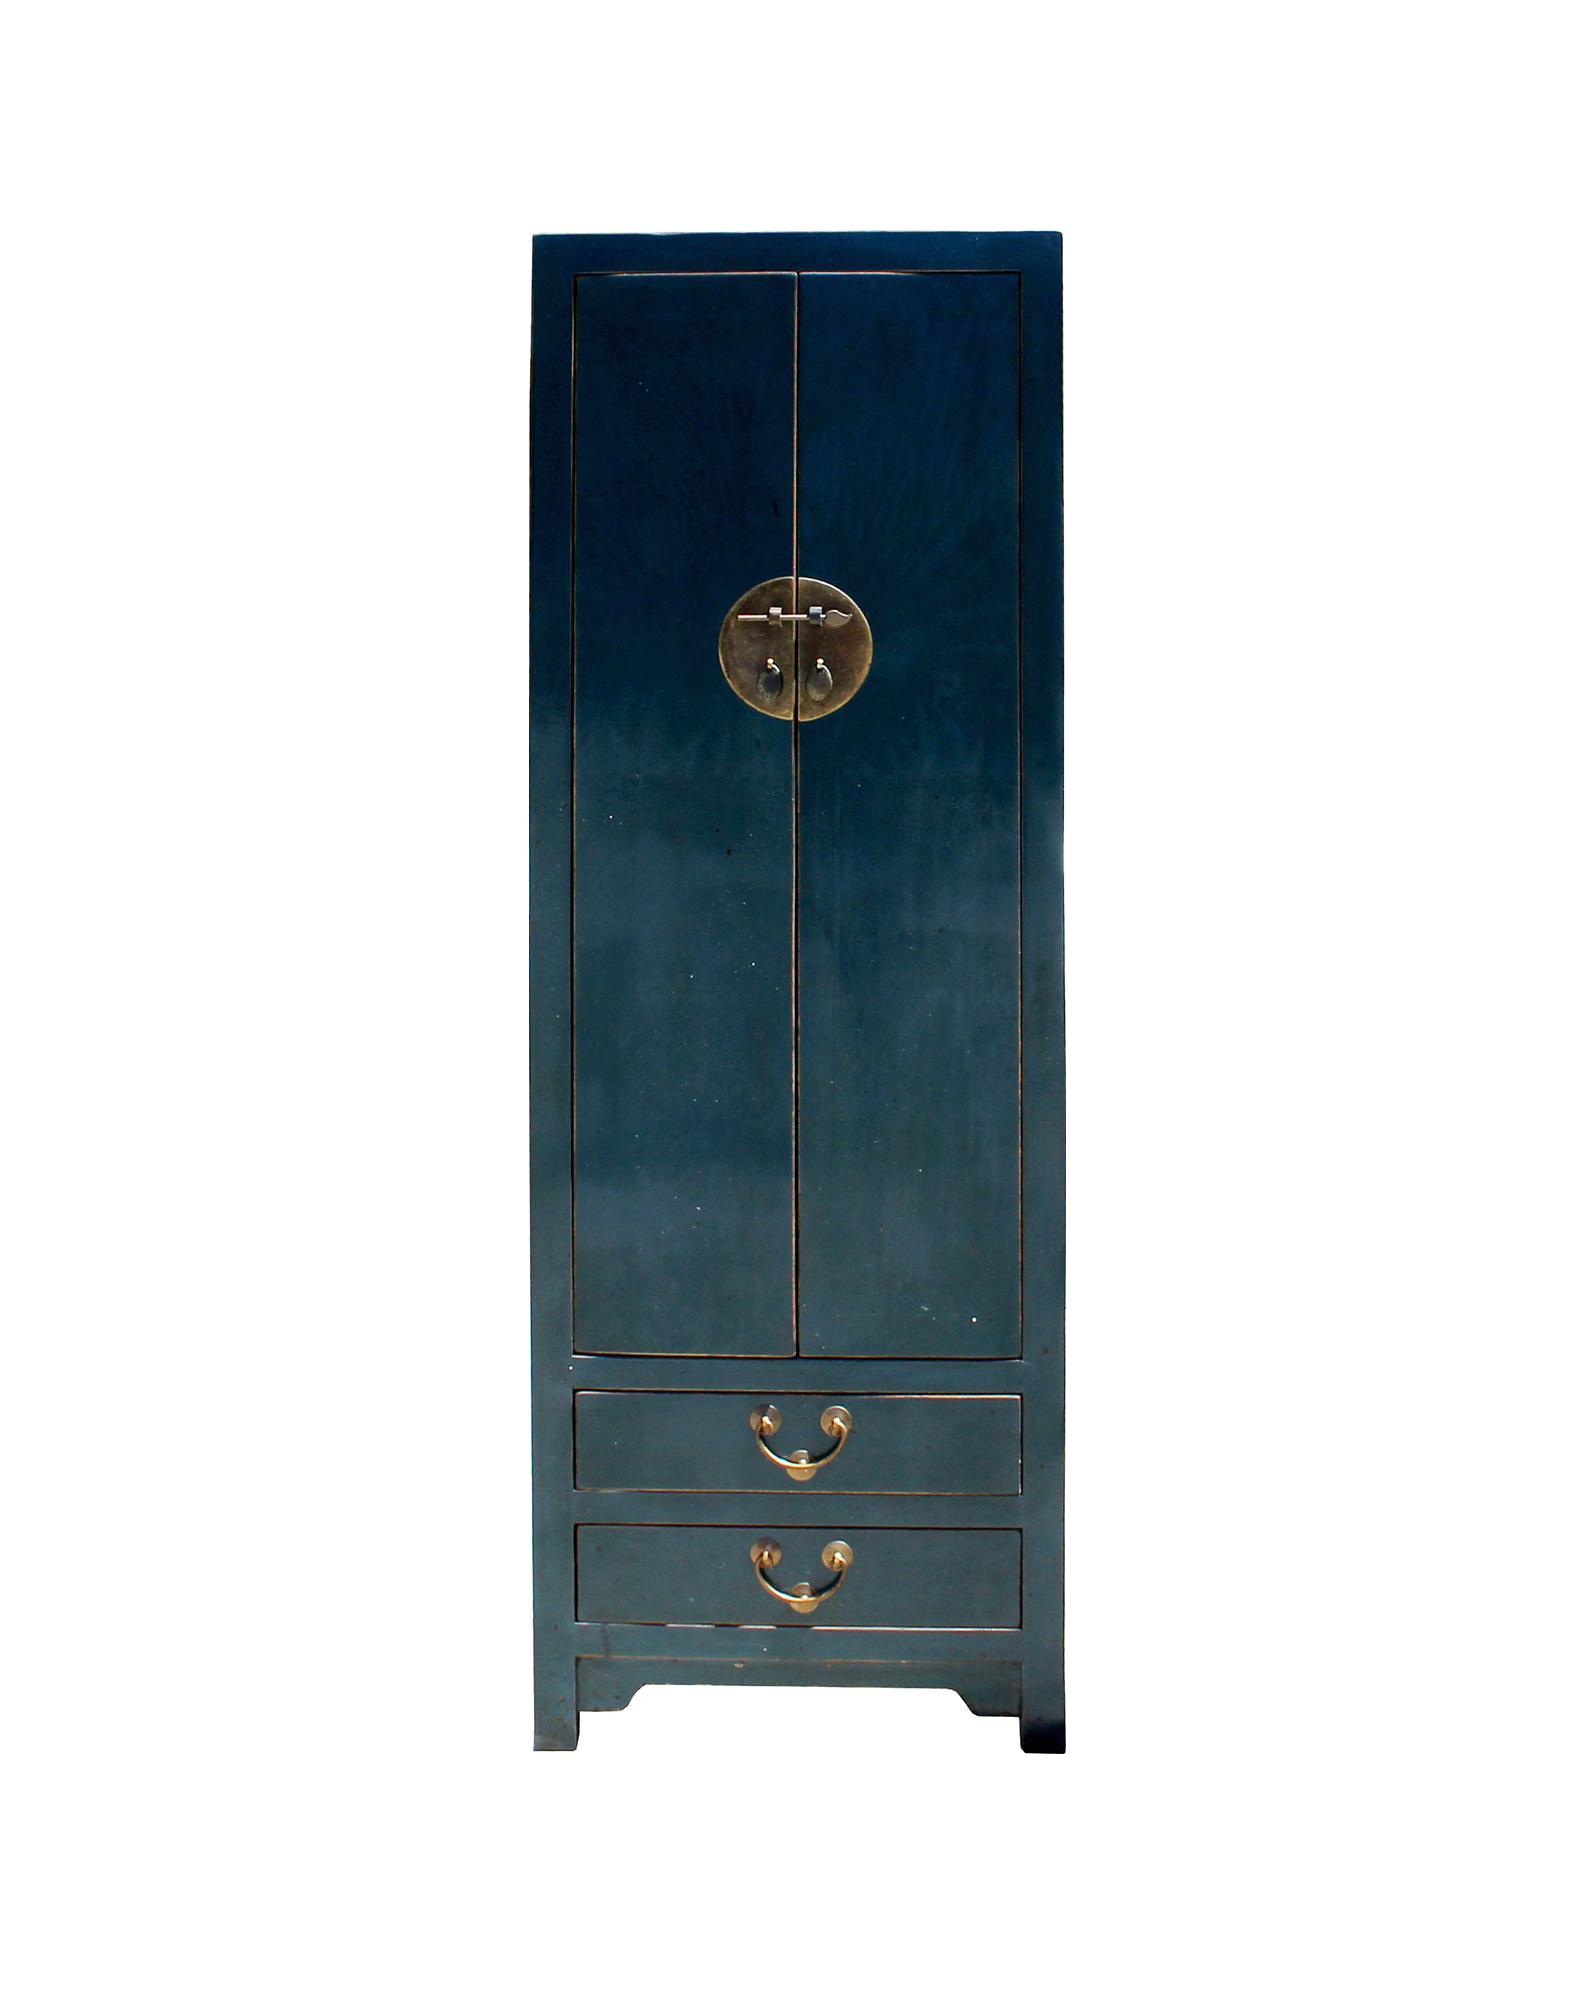 Chinese Vintage Hardware Dark Teal Blue Tall Storage Cabinet